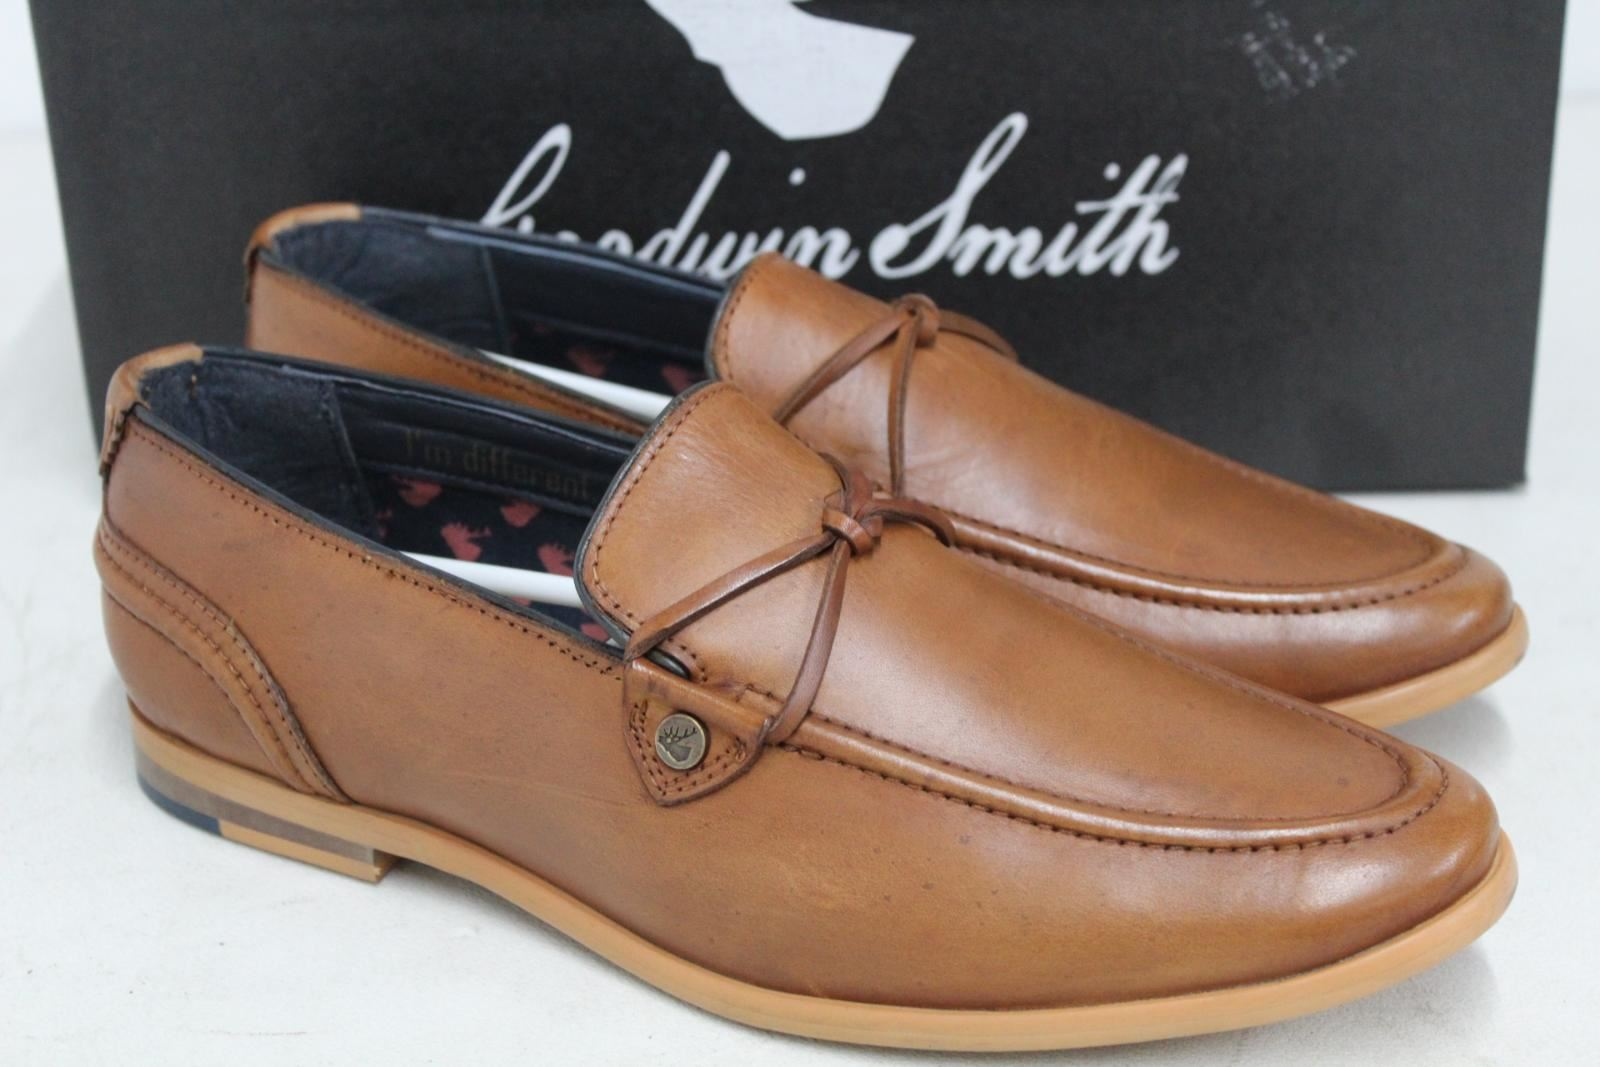 Goodwin-Smith-Para-Hombre-Napoli-Tanga-Zapato-Marron-Sin-Cordones-Mocasin-Cuero-UK8-EU42-Nuevo